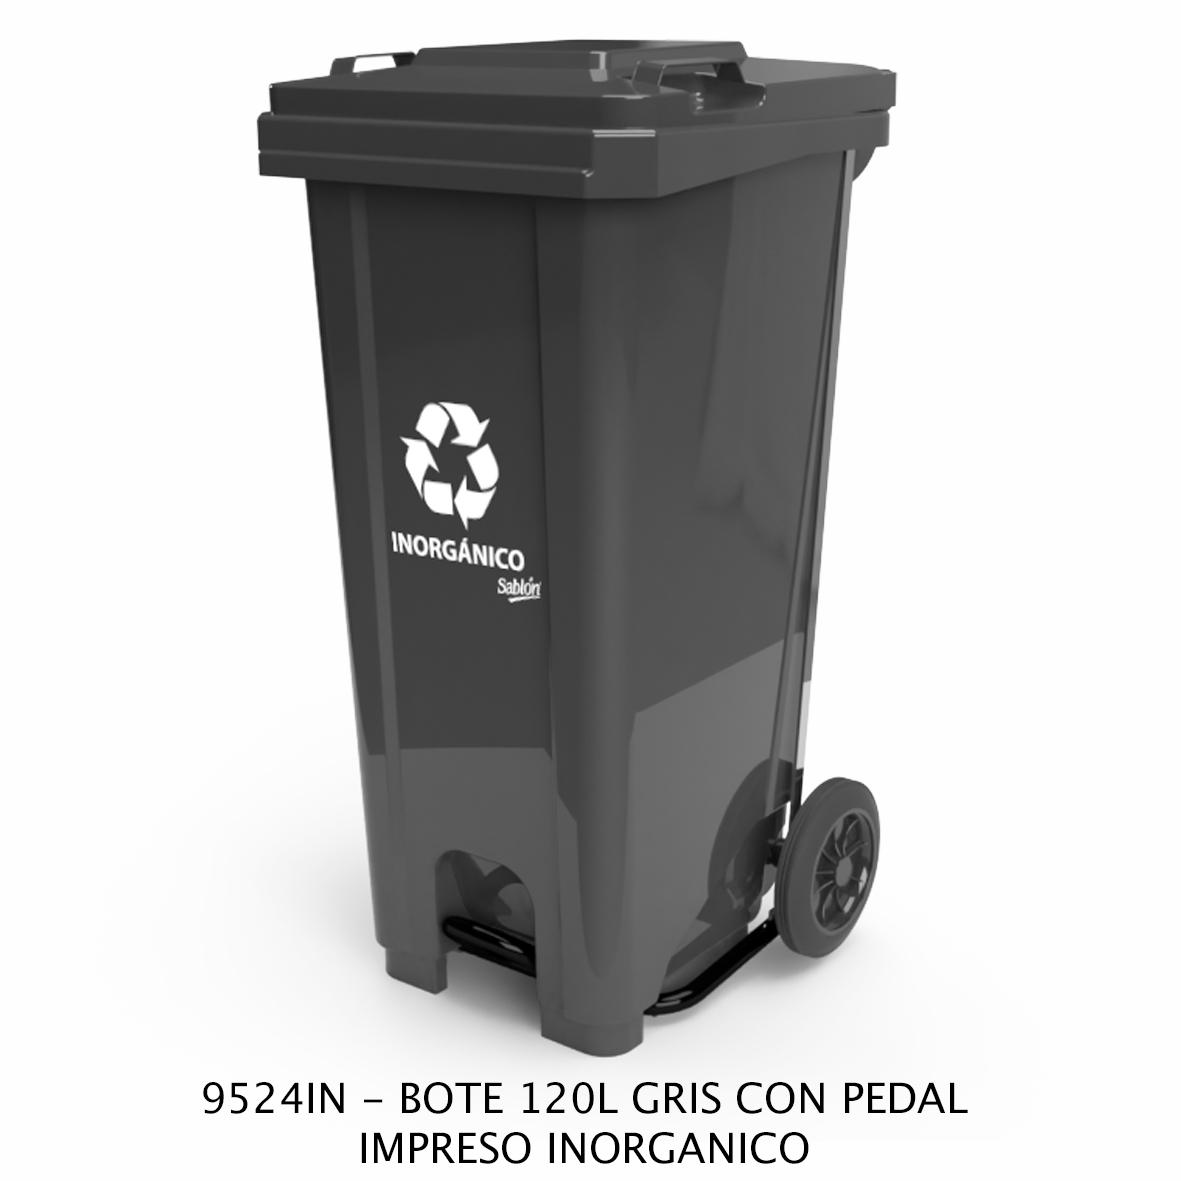 Bote de basura de 120 litros con pedal con impreso inorgánico color gris modelo 9524IN de Sablón